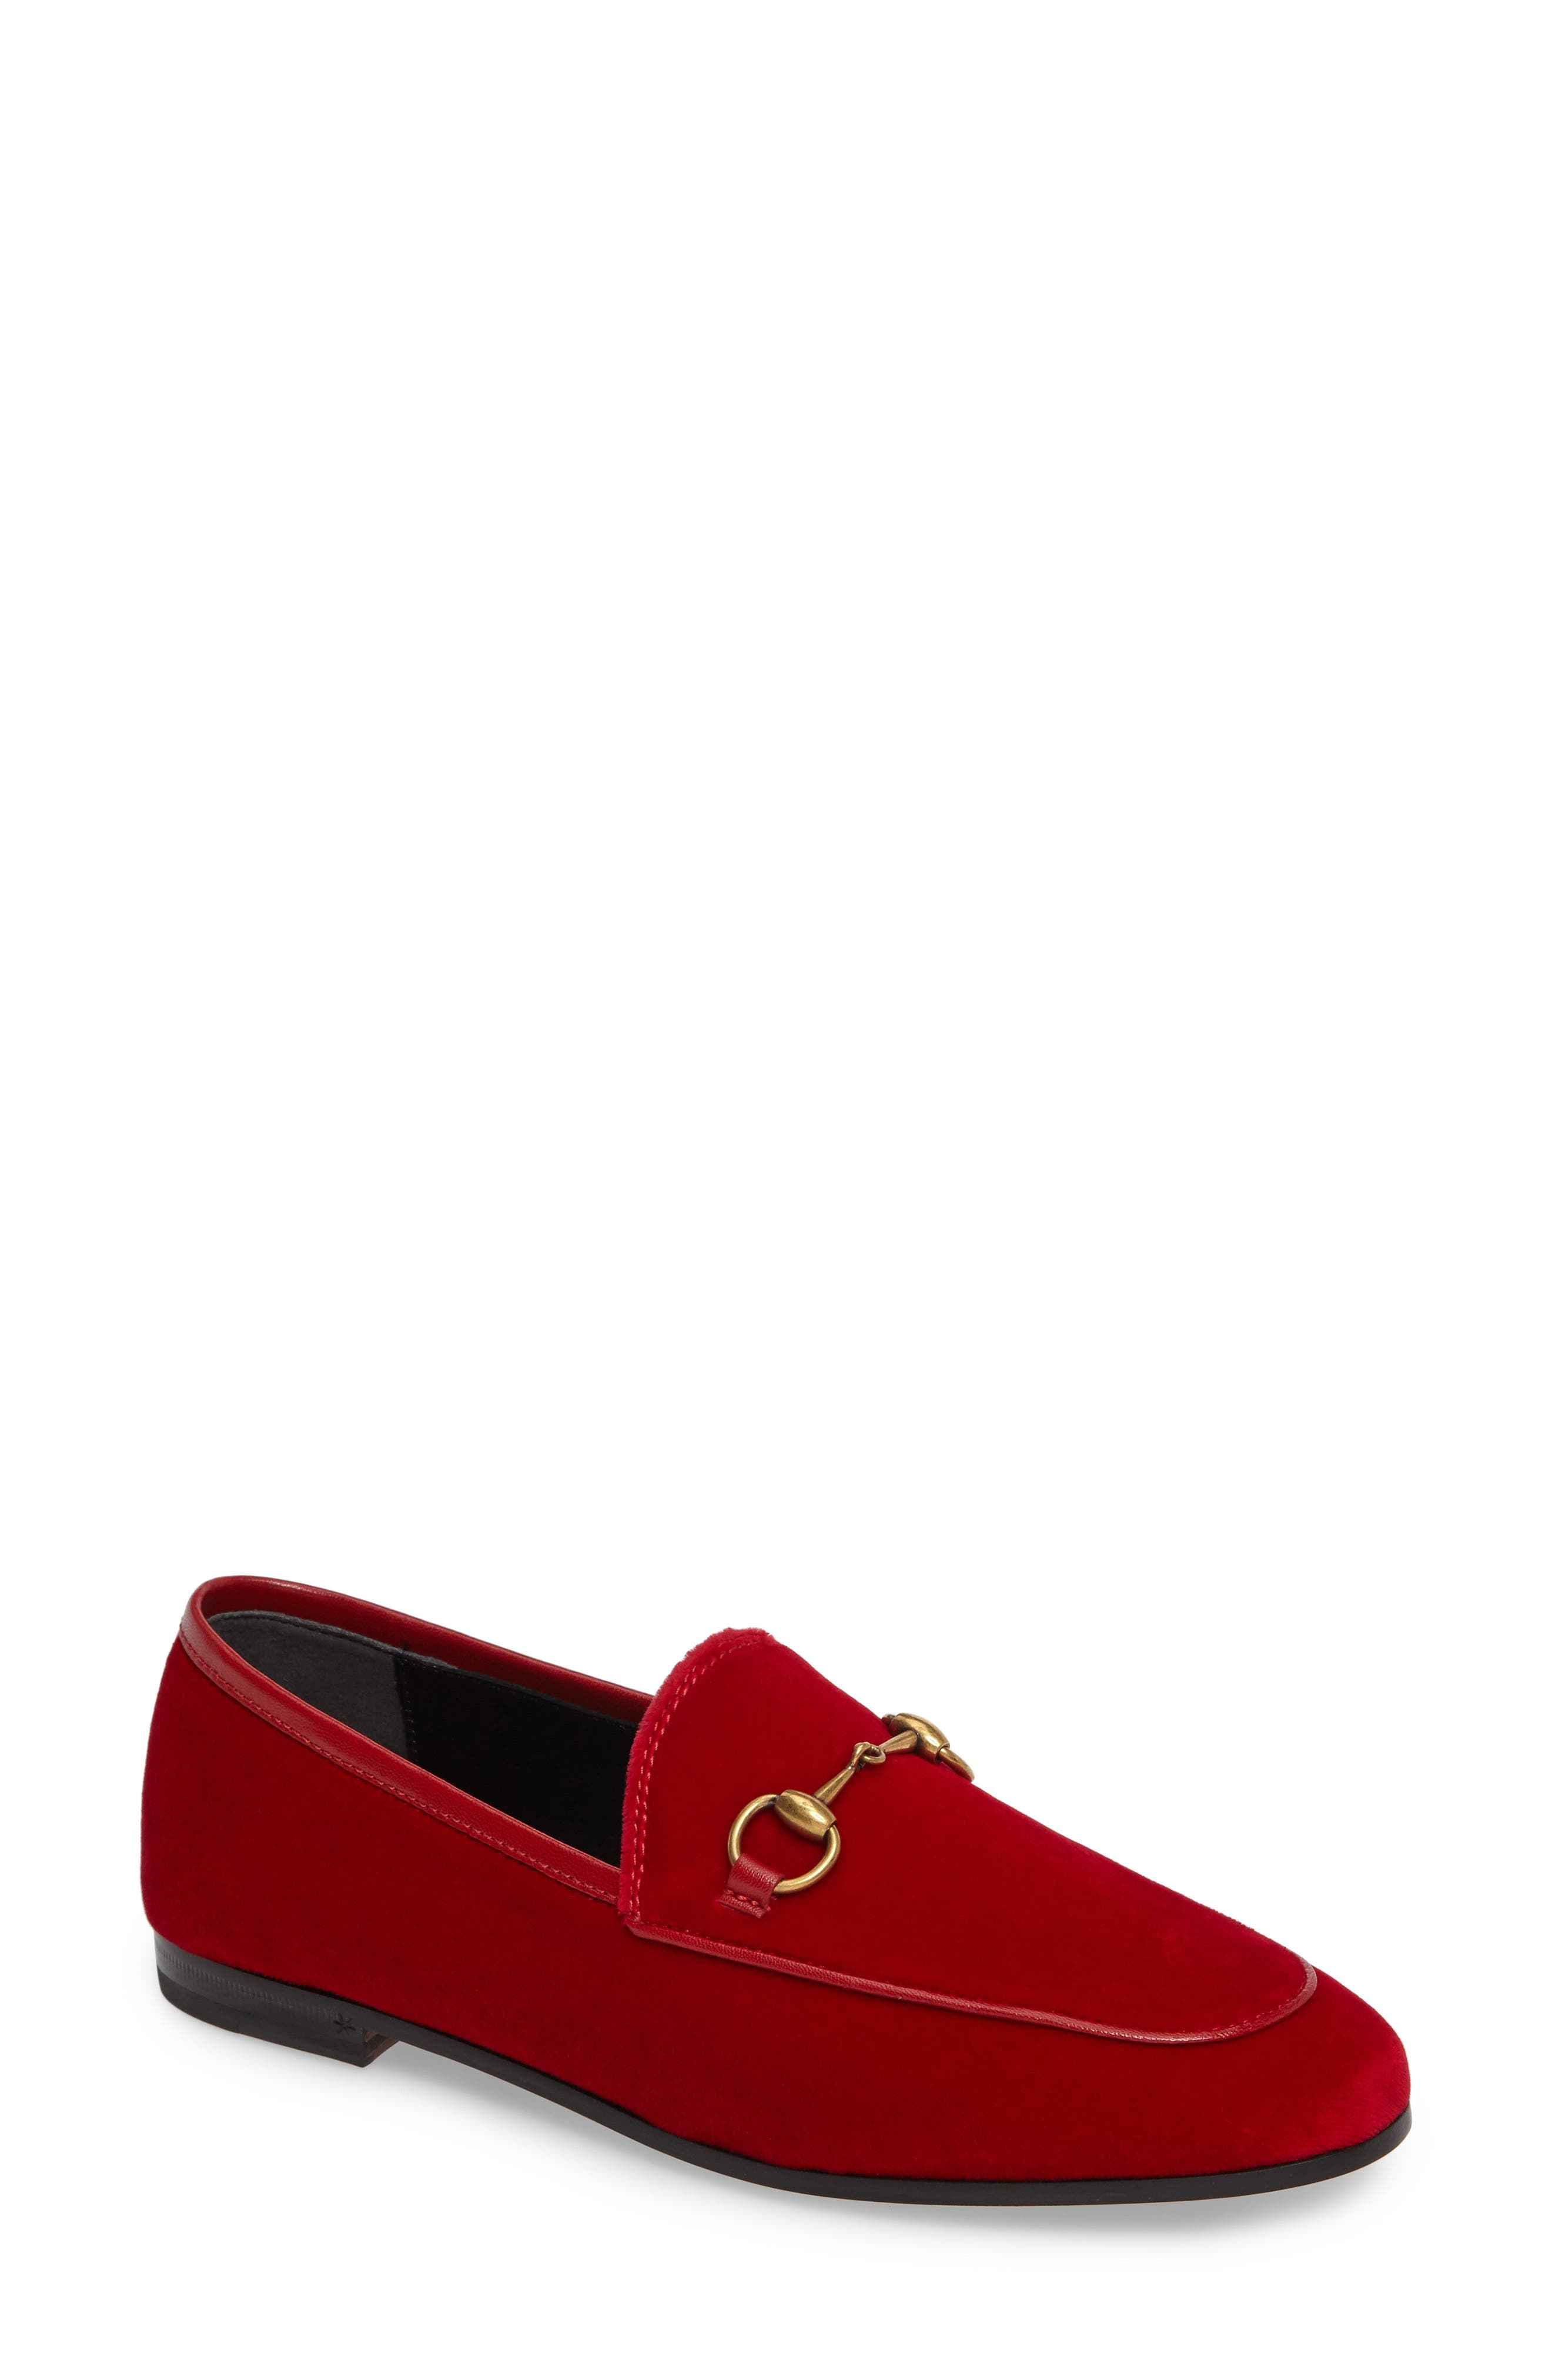 Main Image - Gucci Brixton Velvet Loafer (Women)